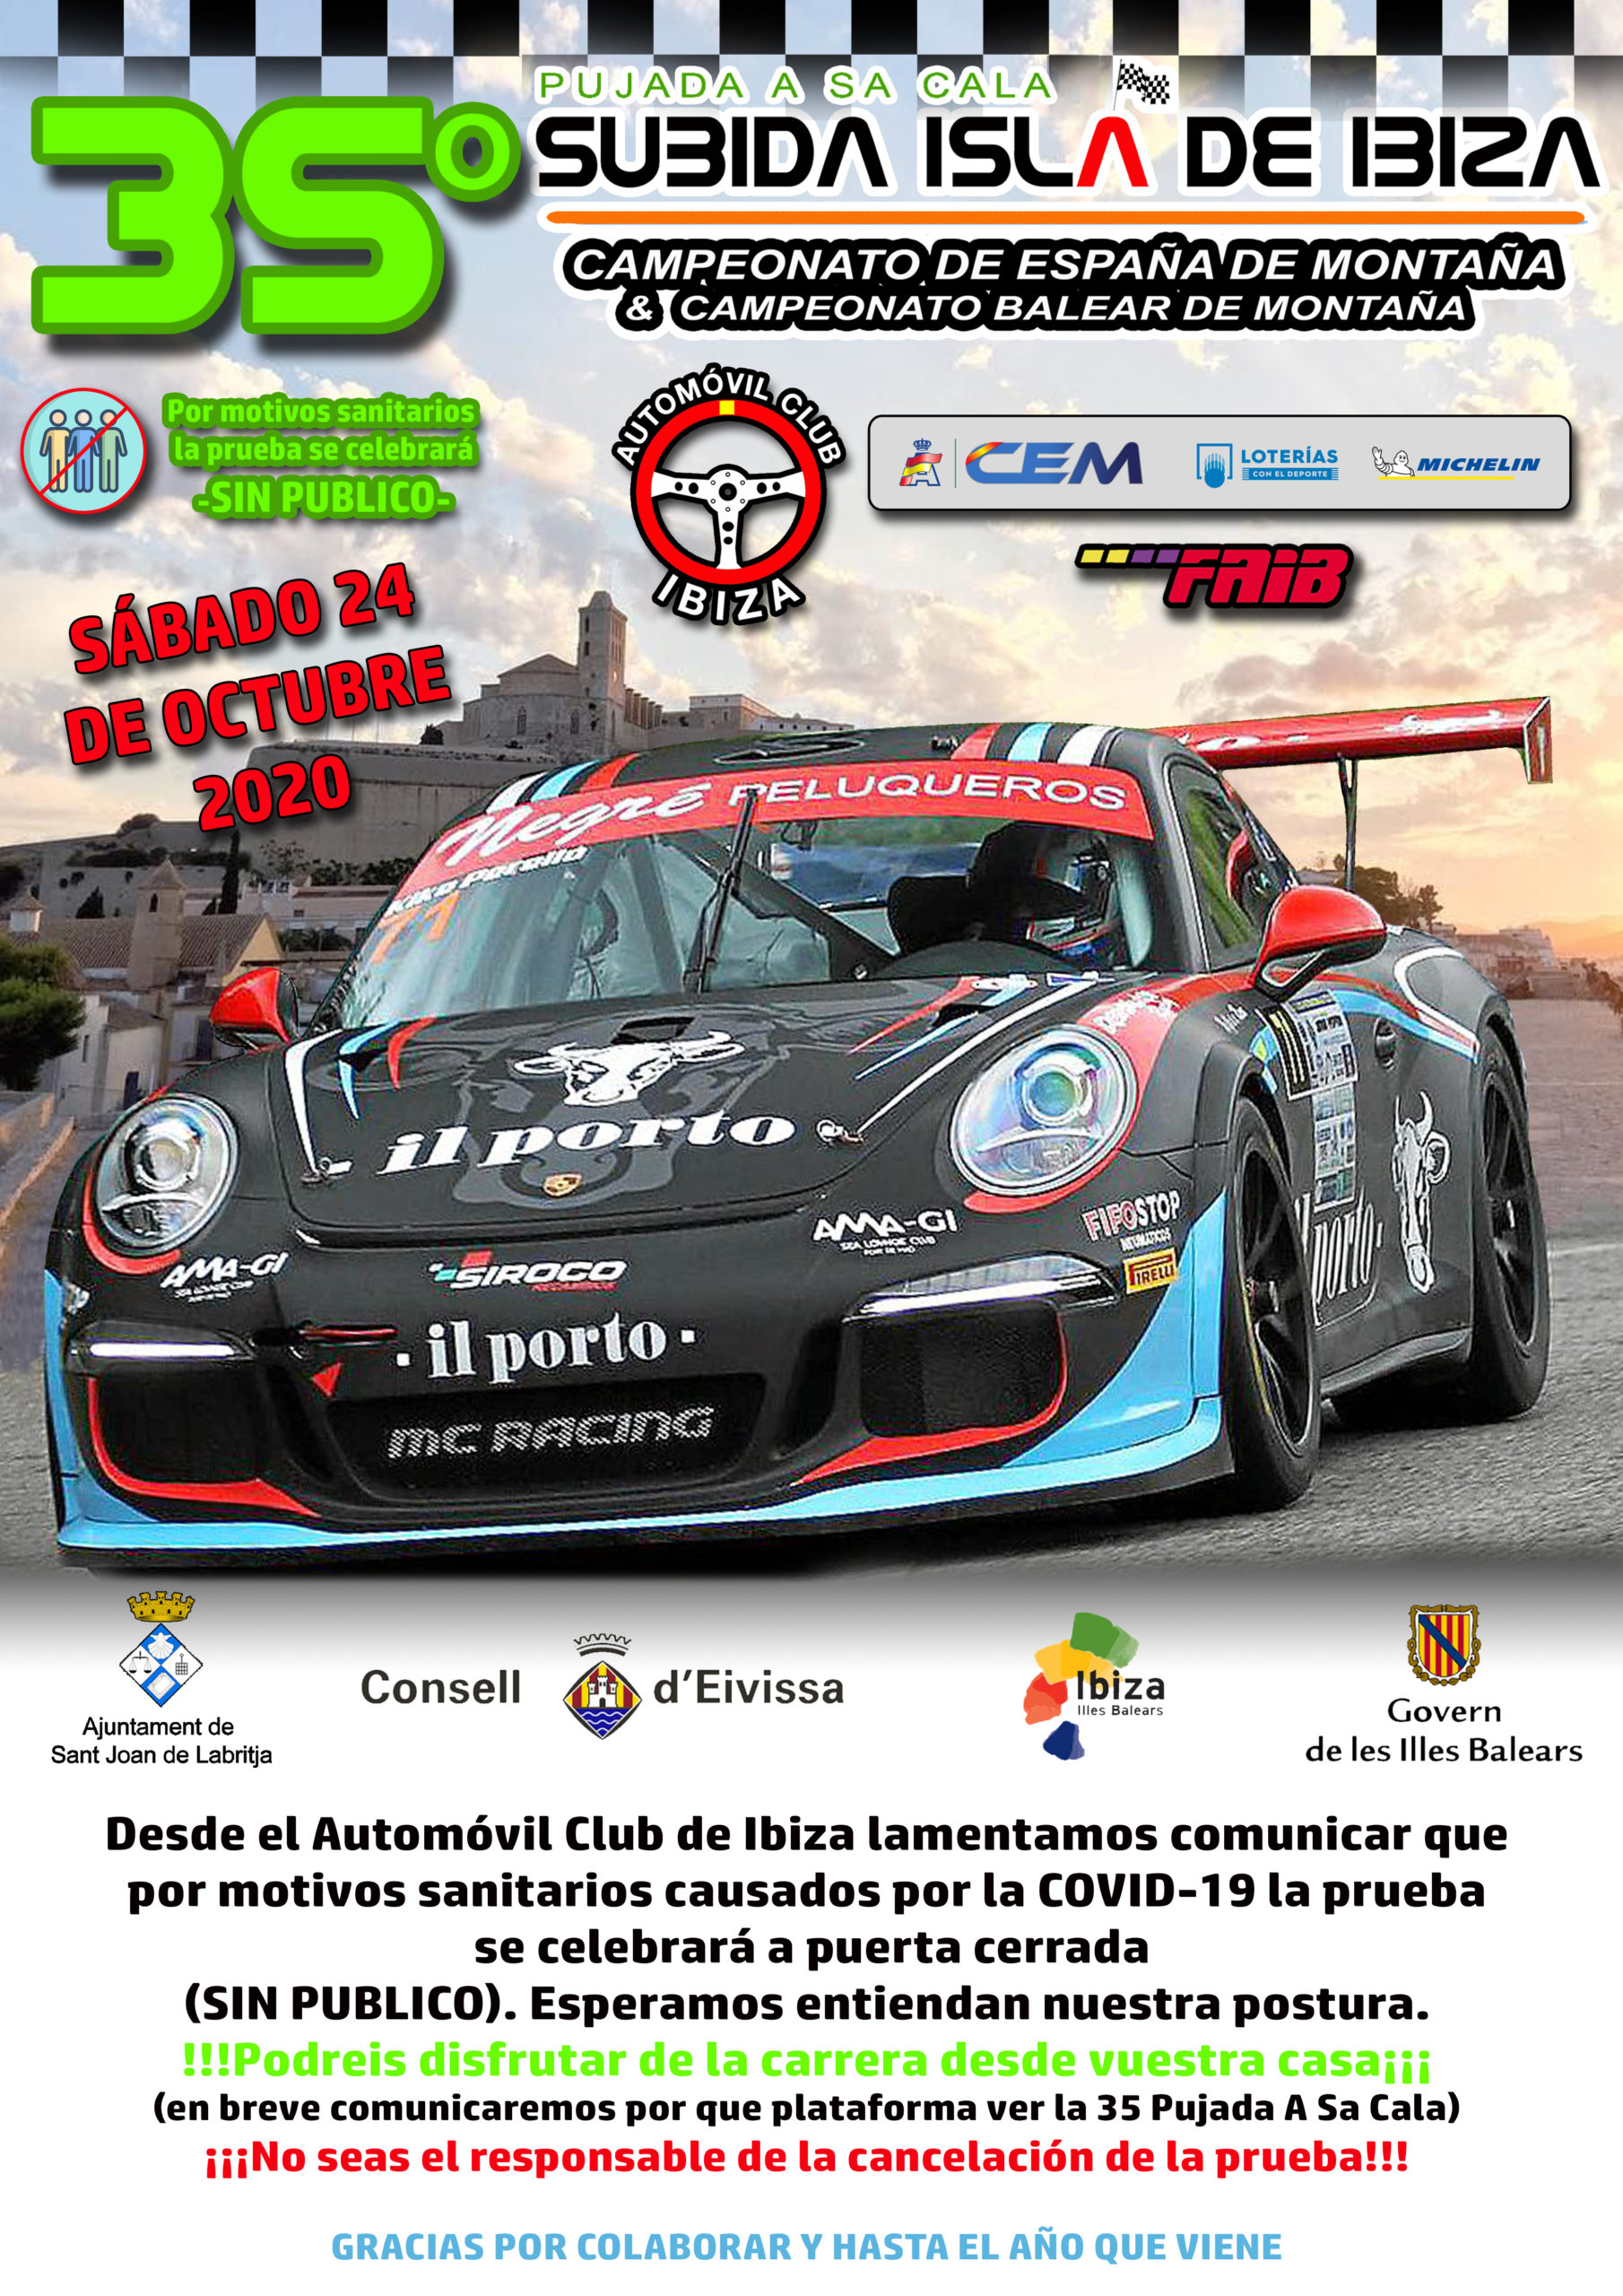 Campeonatos de Montaña Nacionales e Internacionales (FIA European Hillclimb, Berg Cup, BHC, CIVM, CFM...) - Página 37 POSTER-35-CALA-logo-sin-pub-scaled